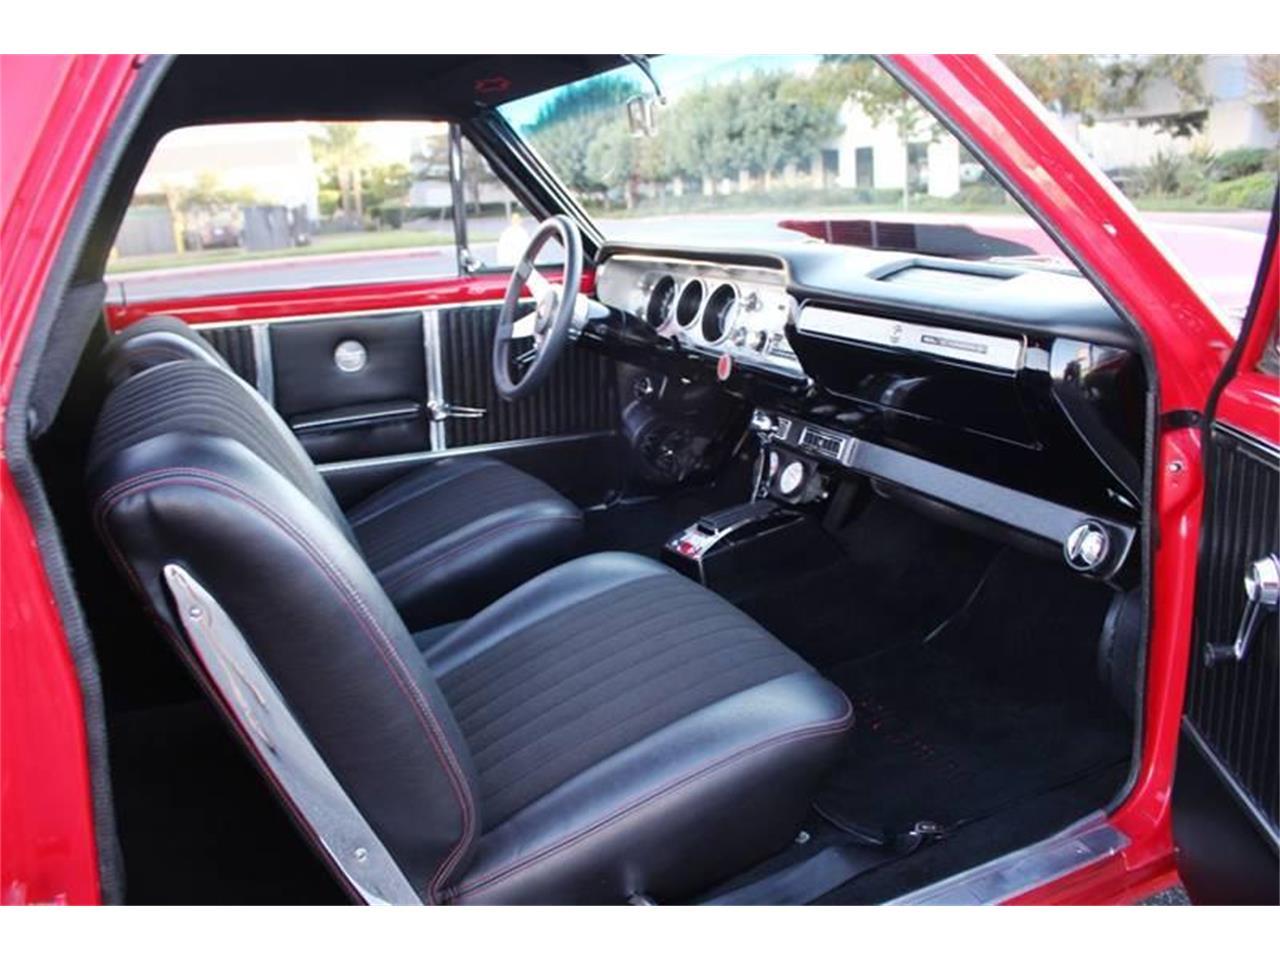 Large Picture of '64 Chevrolet El Camino located in La Verne California - MH9D